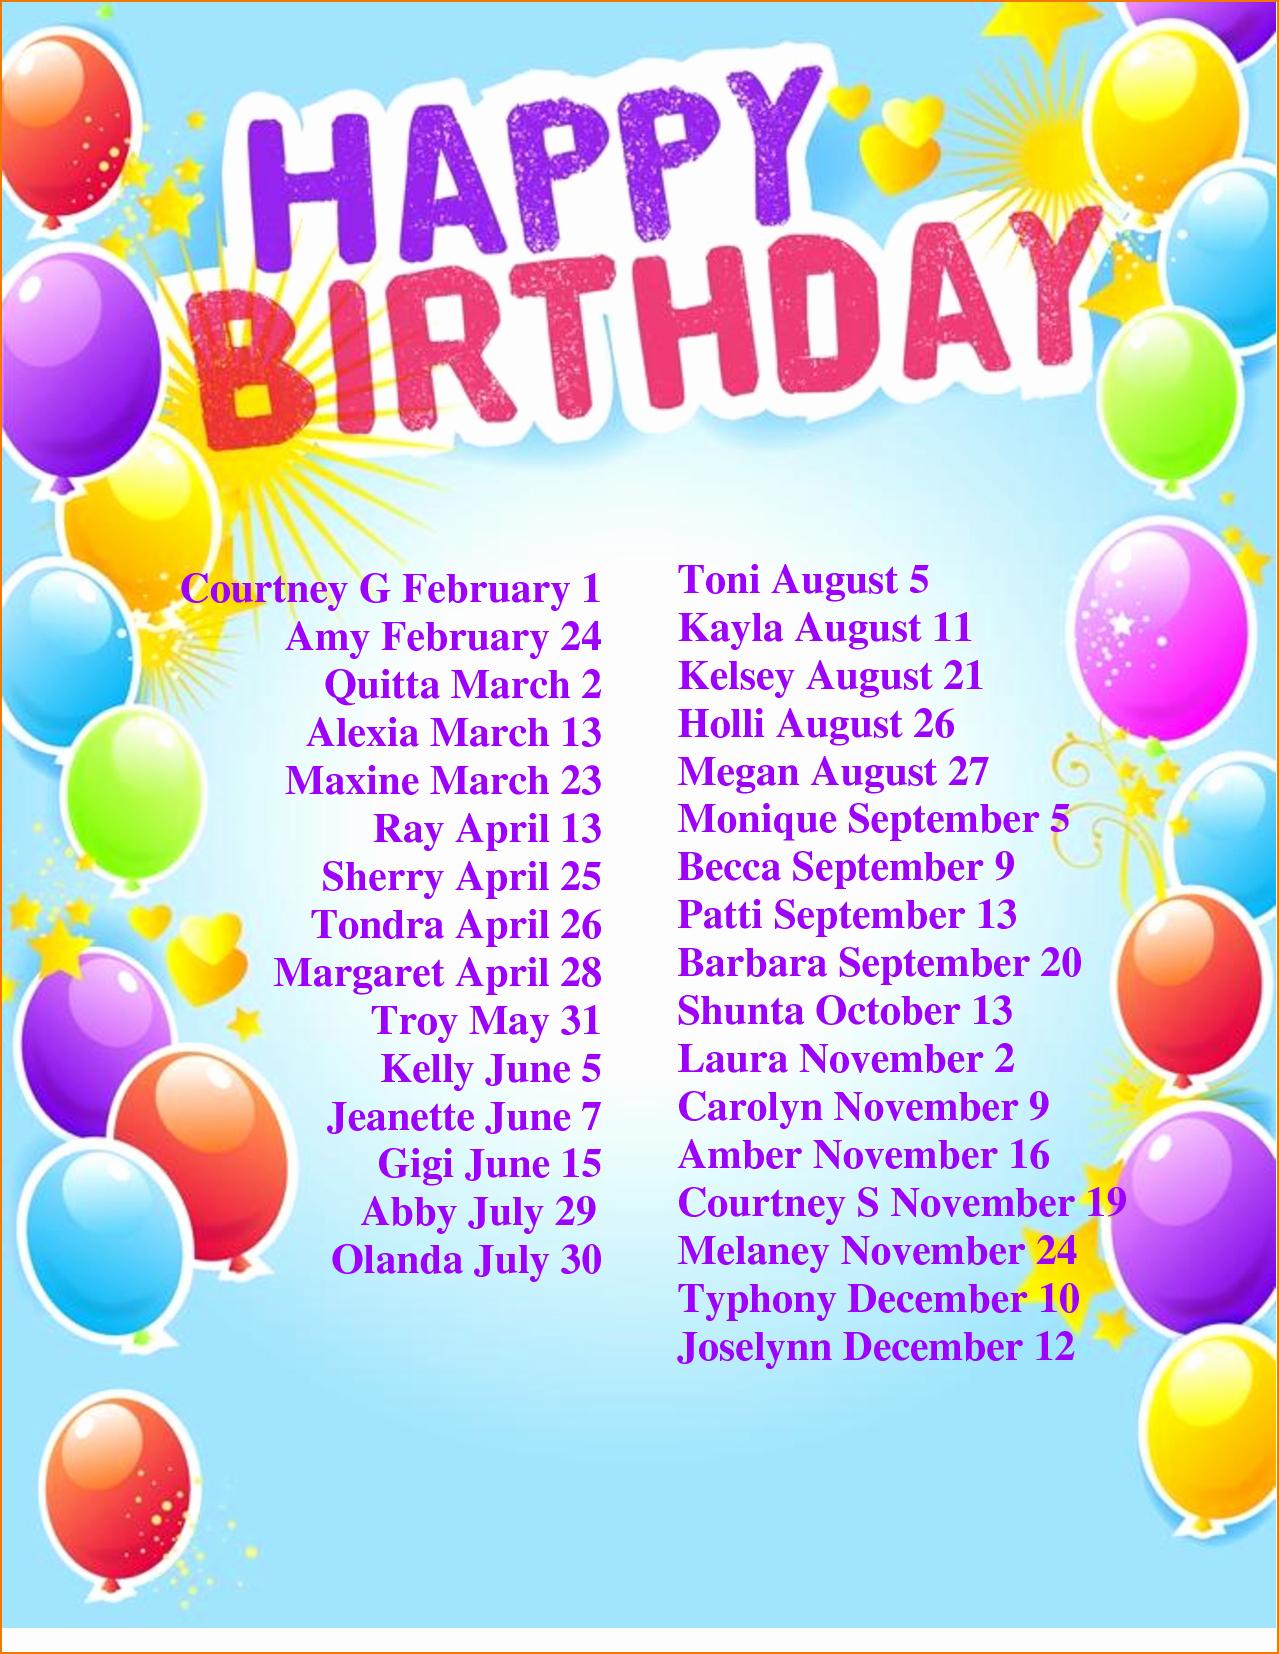 Employee Birthday List Template Luxury Birthday List Template Excel Employee Free Financial